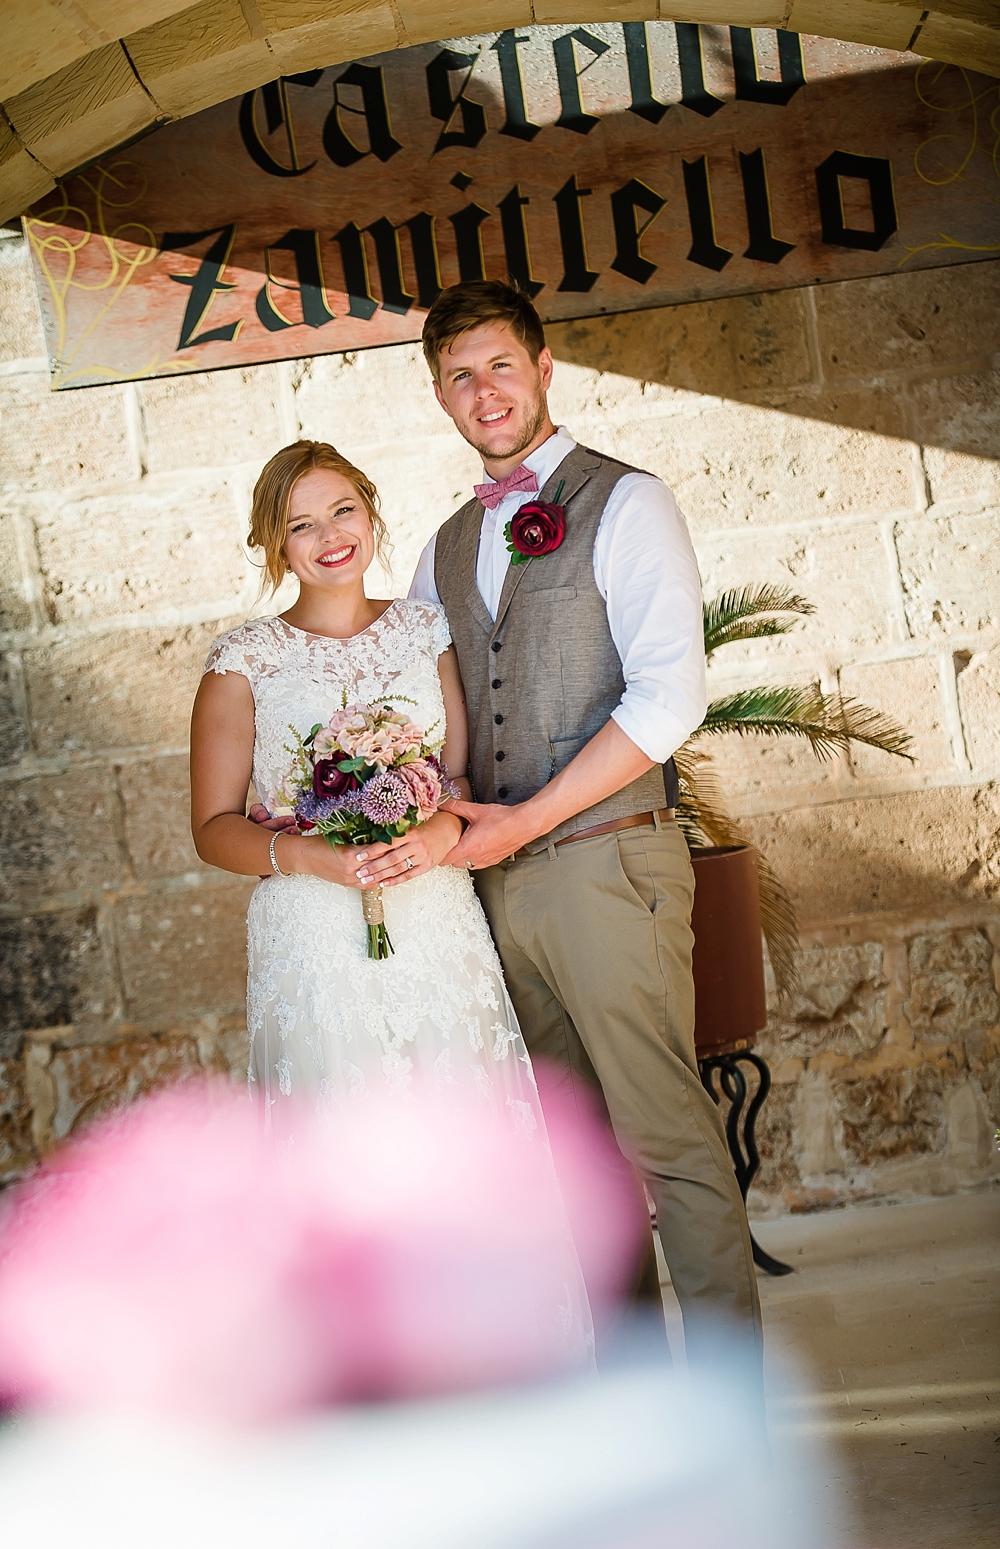 Castello Zamittello Wedding - Photography Malta - Shane P. Watts